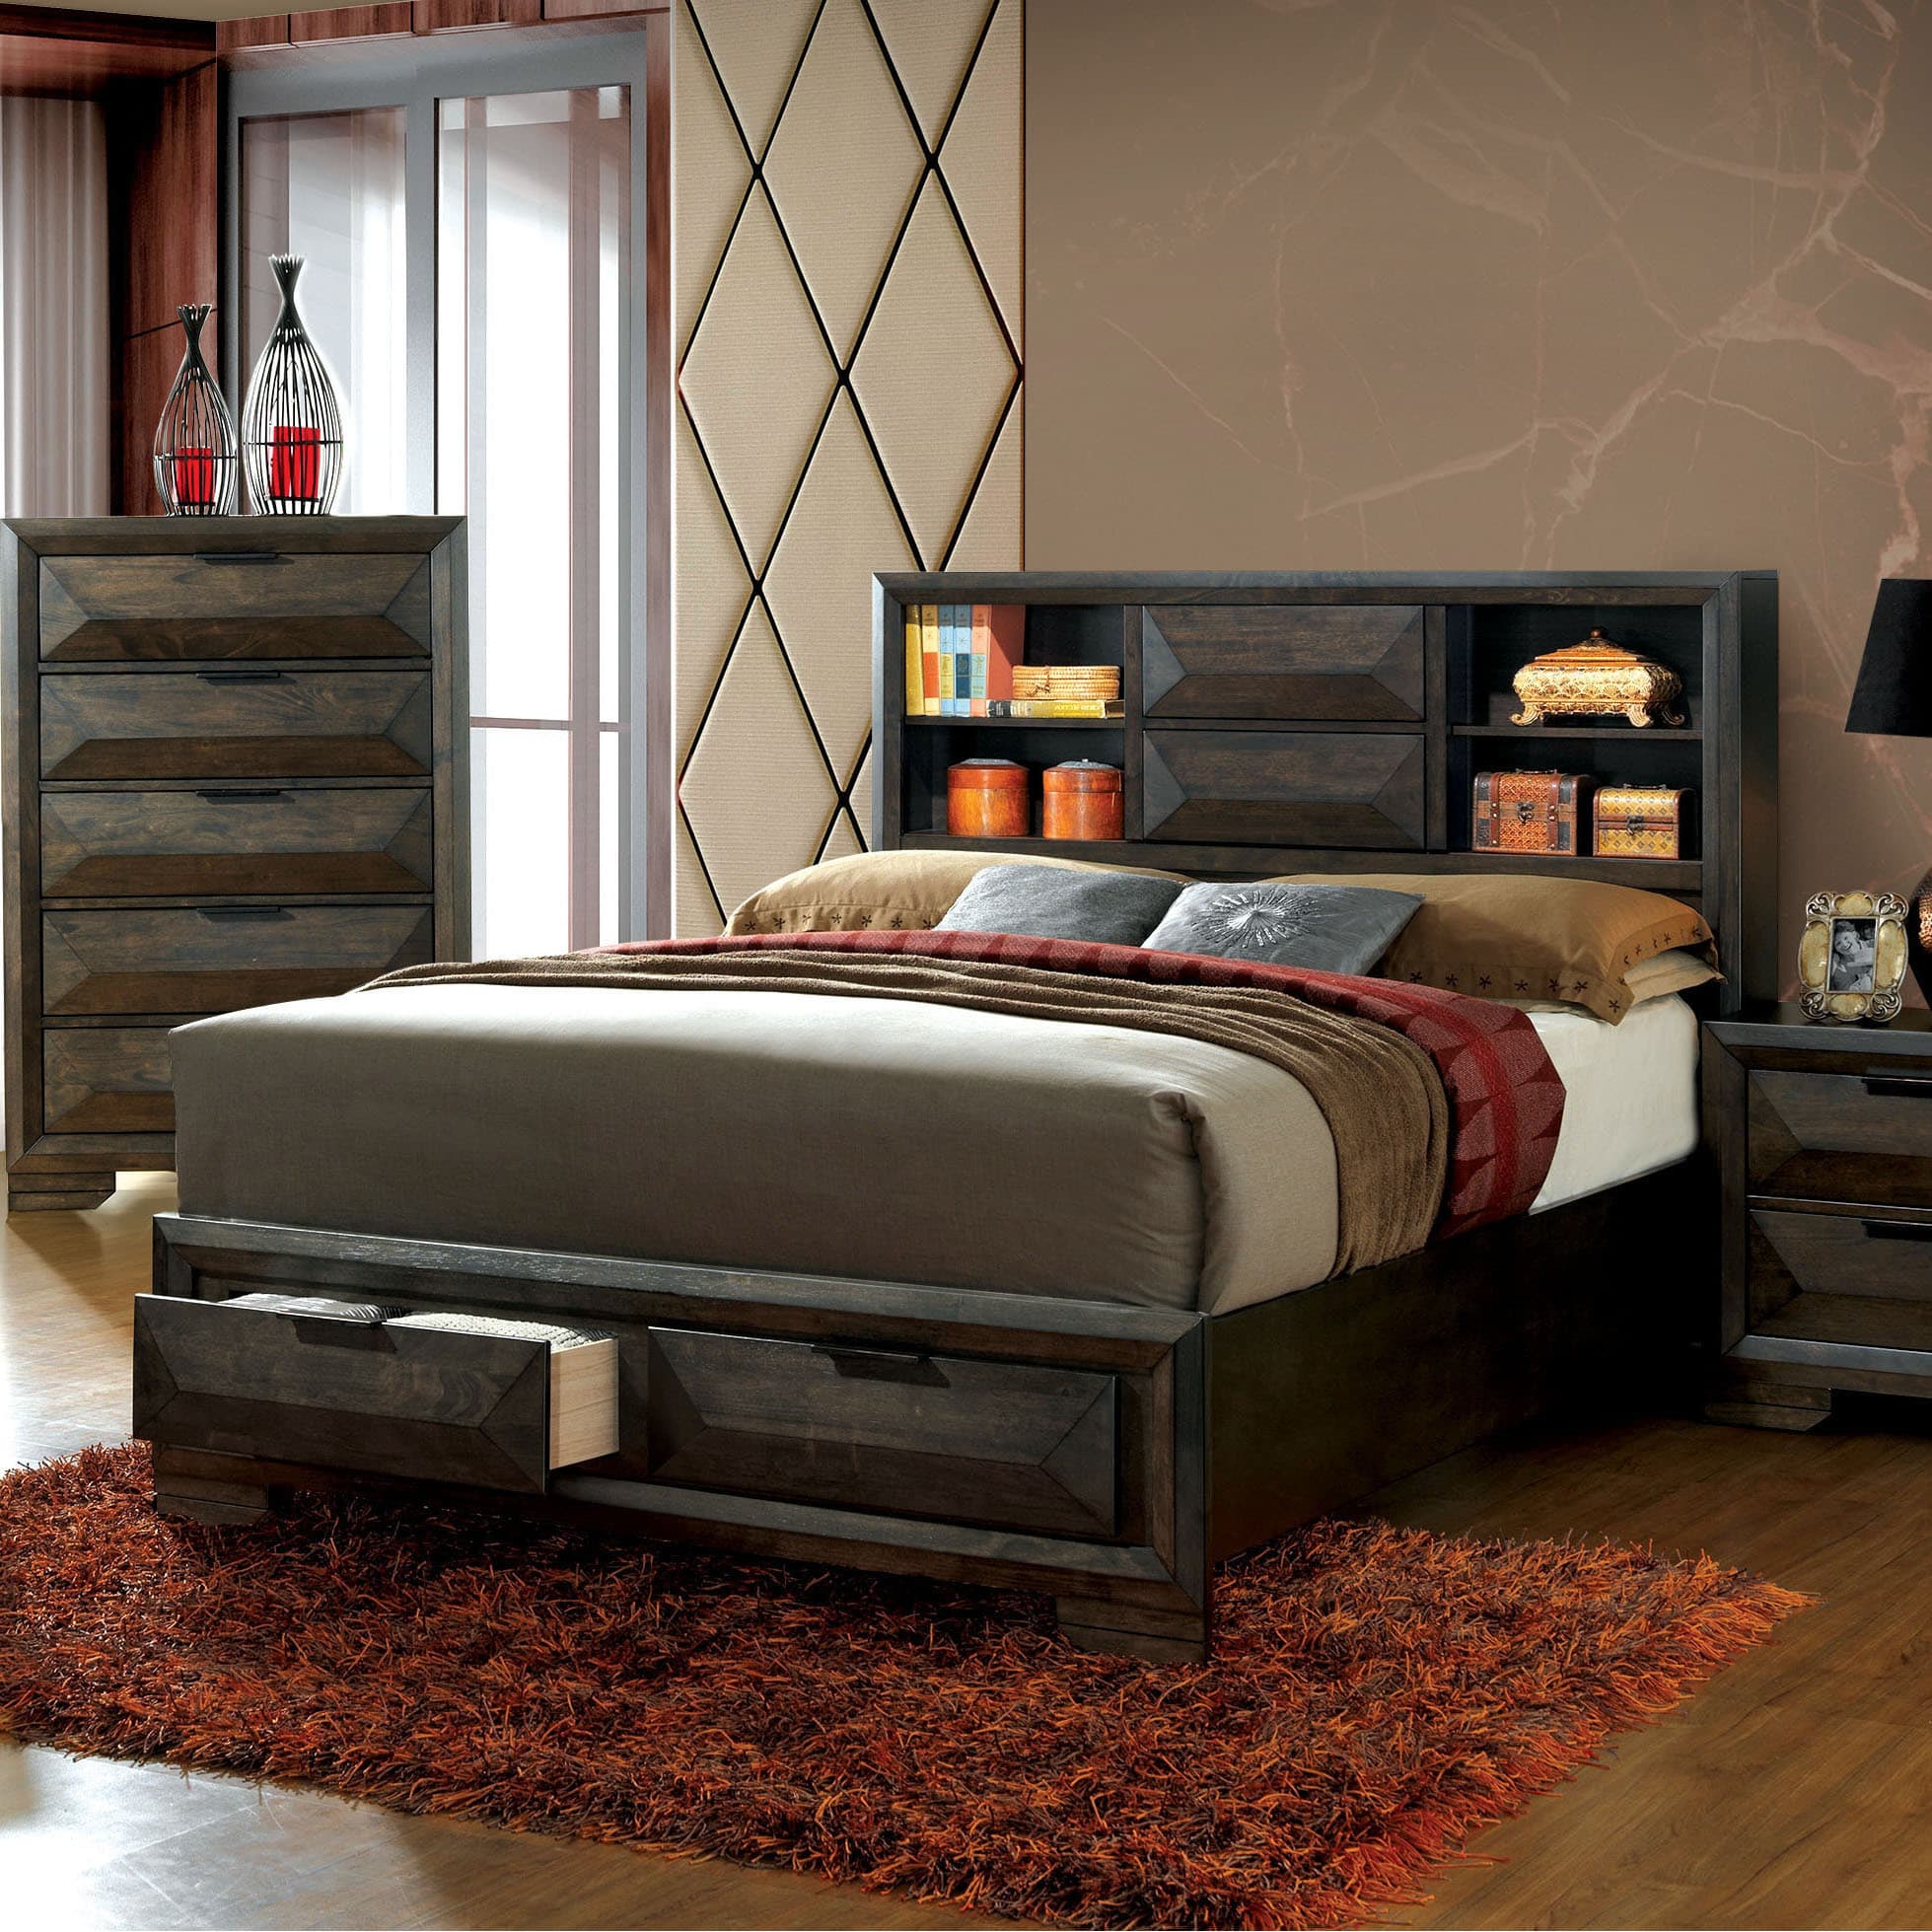 Furniture Of America Stayven Contemporary Bookcase Headboard